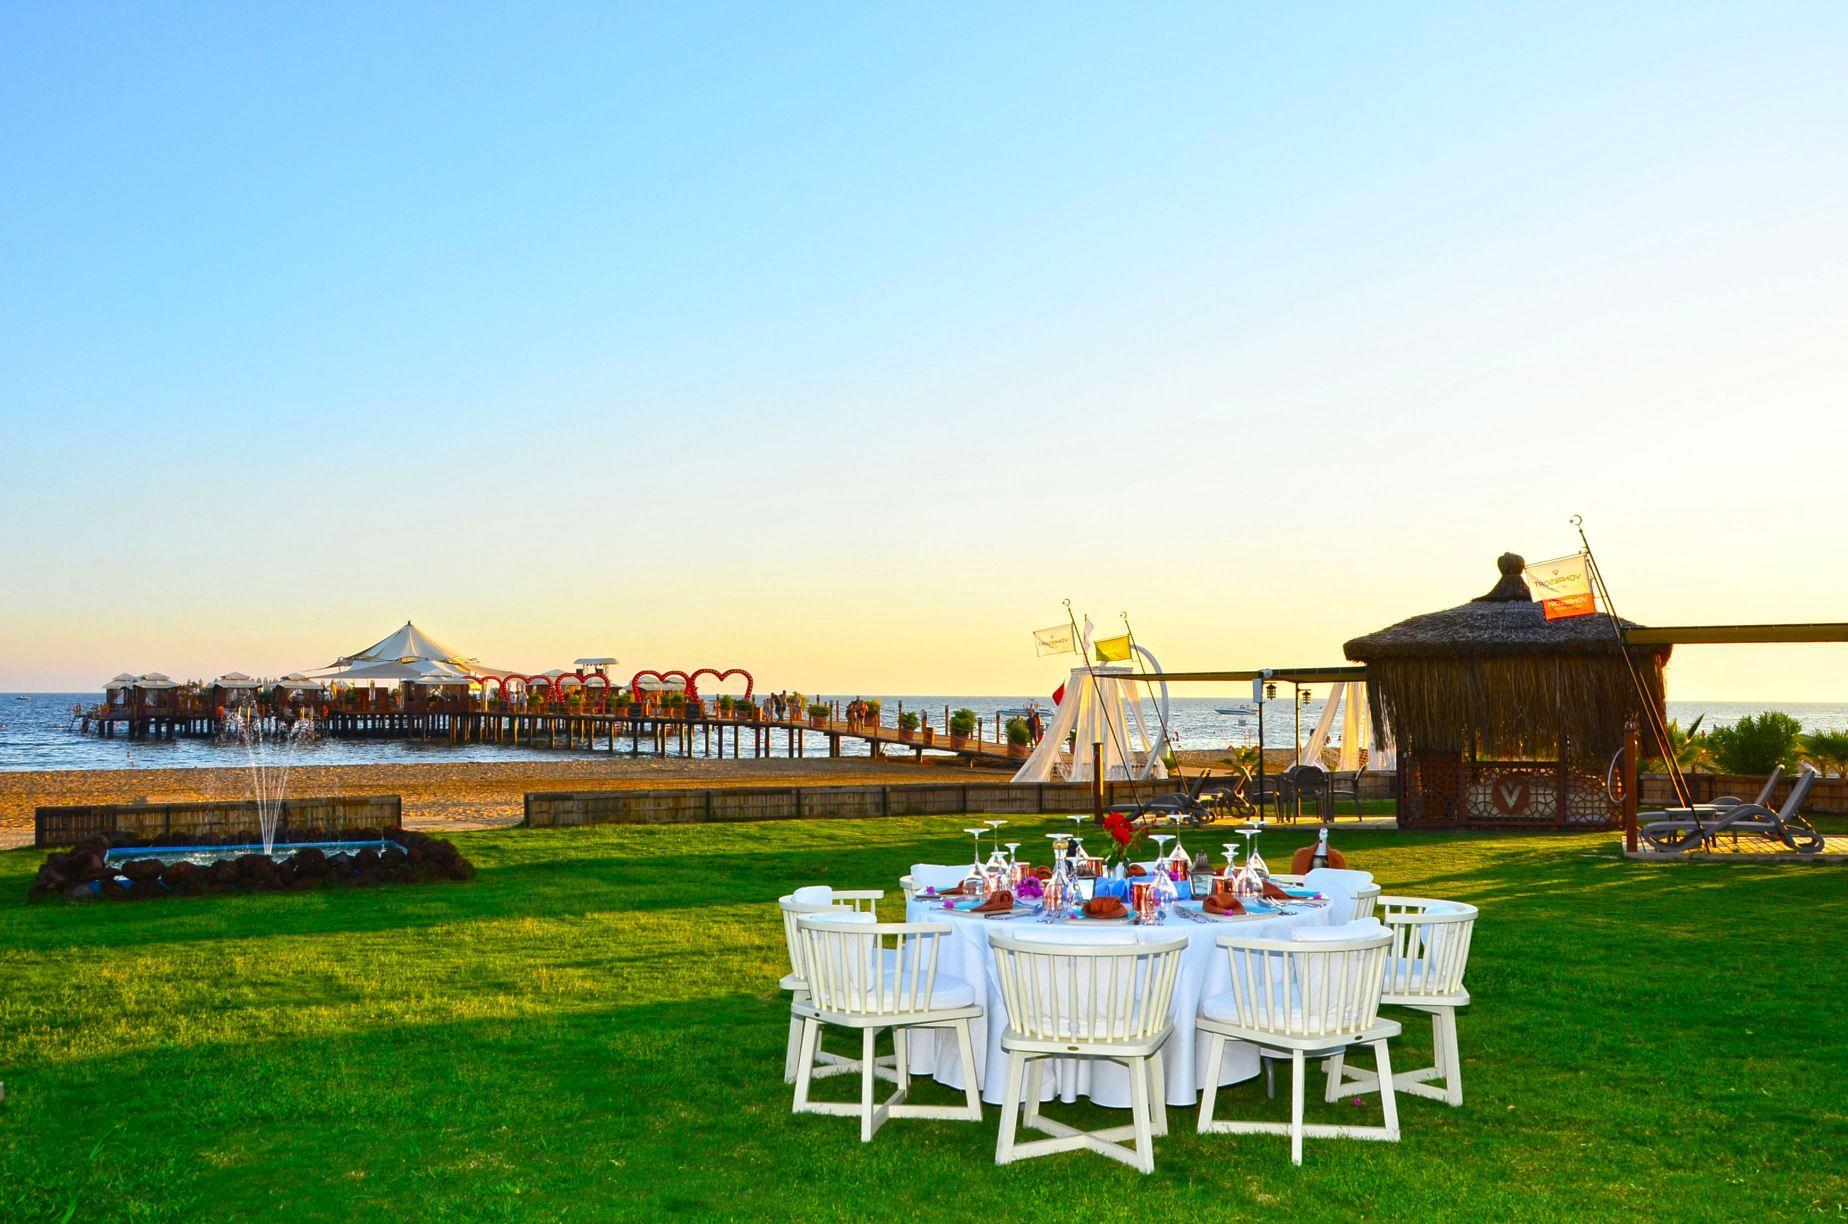 http://www.orextravel.sk/OREX/hotelphotos/vonresort-golden-coast-general-0045.jpg